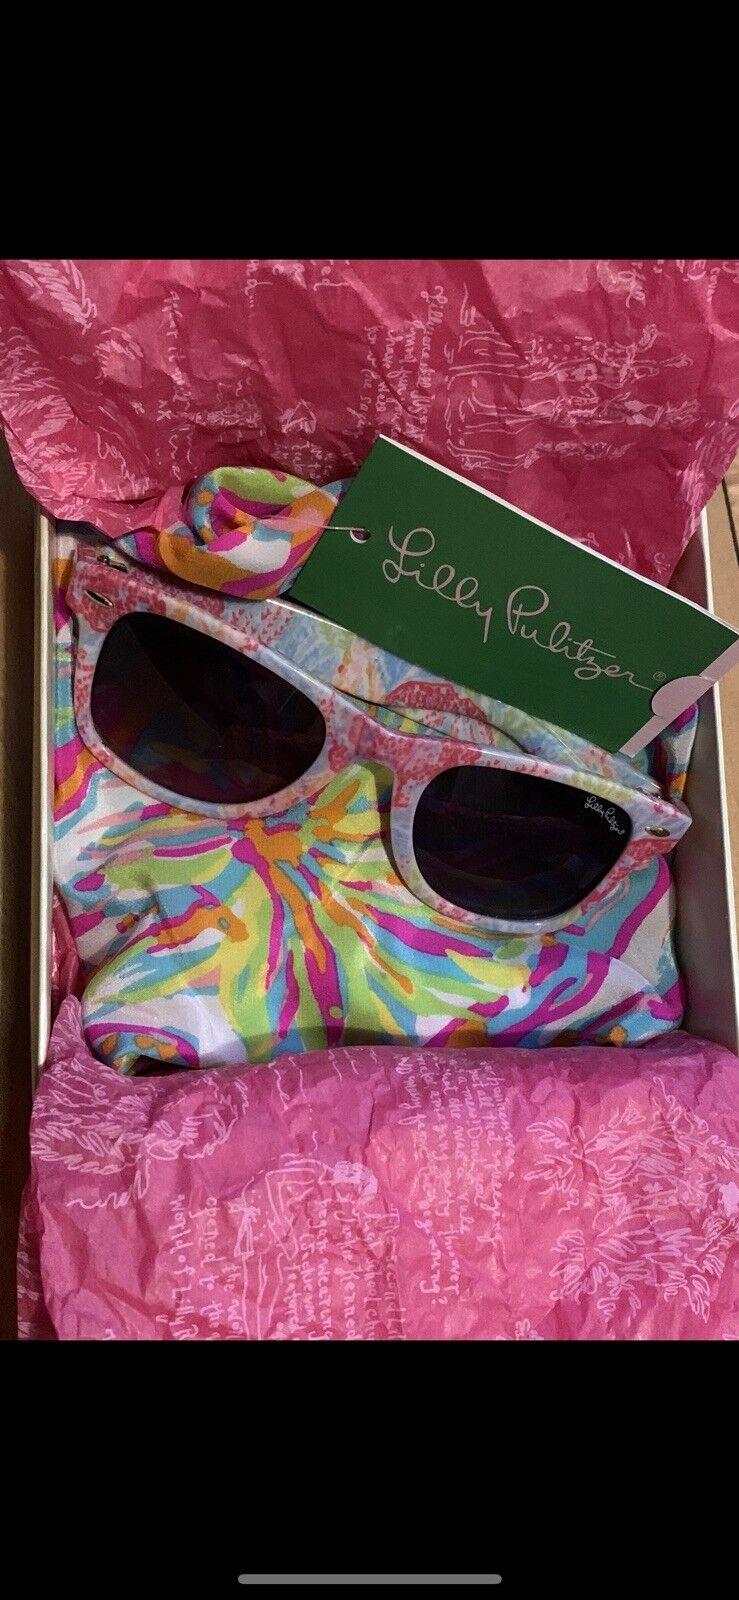 2pc NEW Lilly Pulitzer Let's Cha Cha Sunglasses + Cosmos Top XXS XS Scuba Cuba